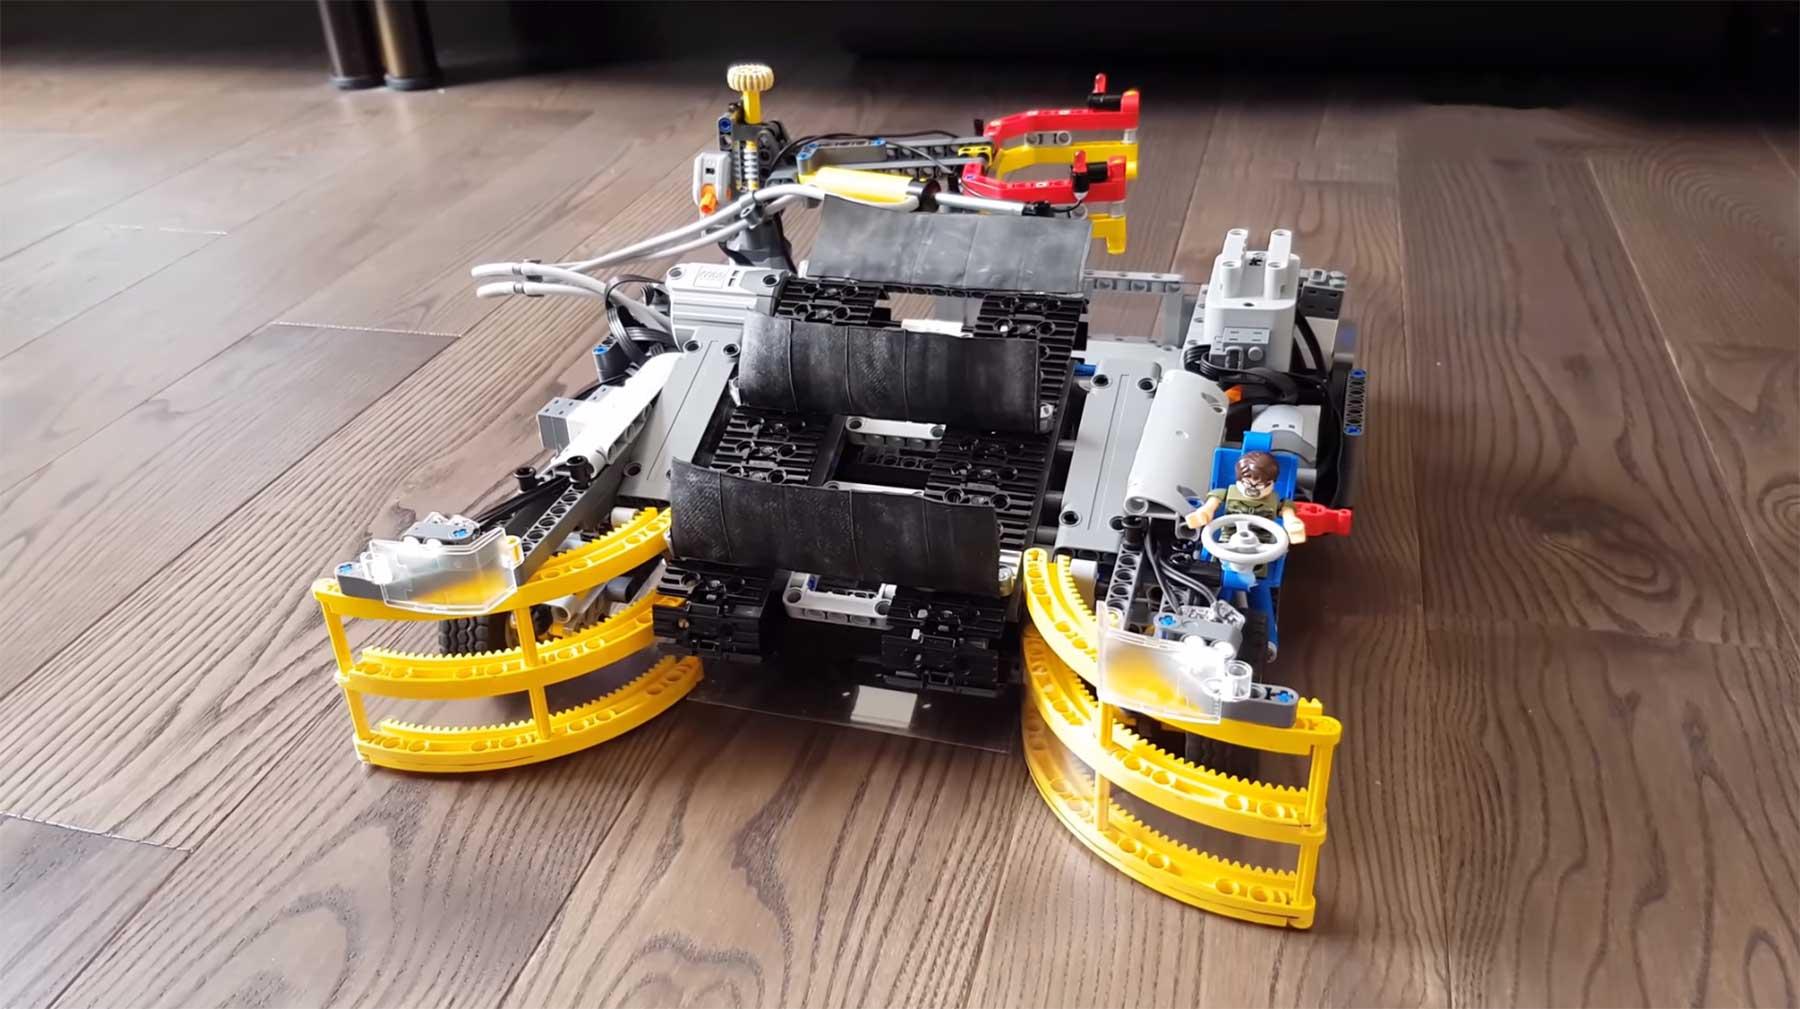 Ein LEGO-Roomba zum LEGO-Aufsammeln lego-roomba